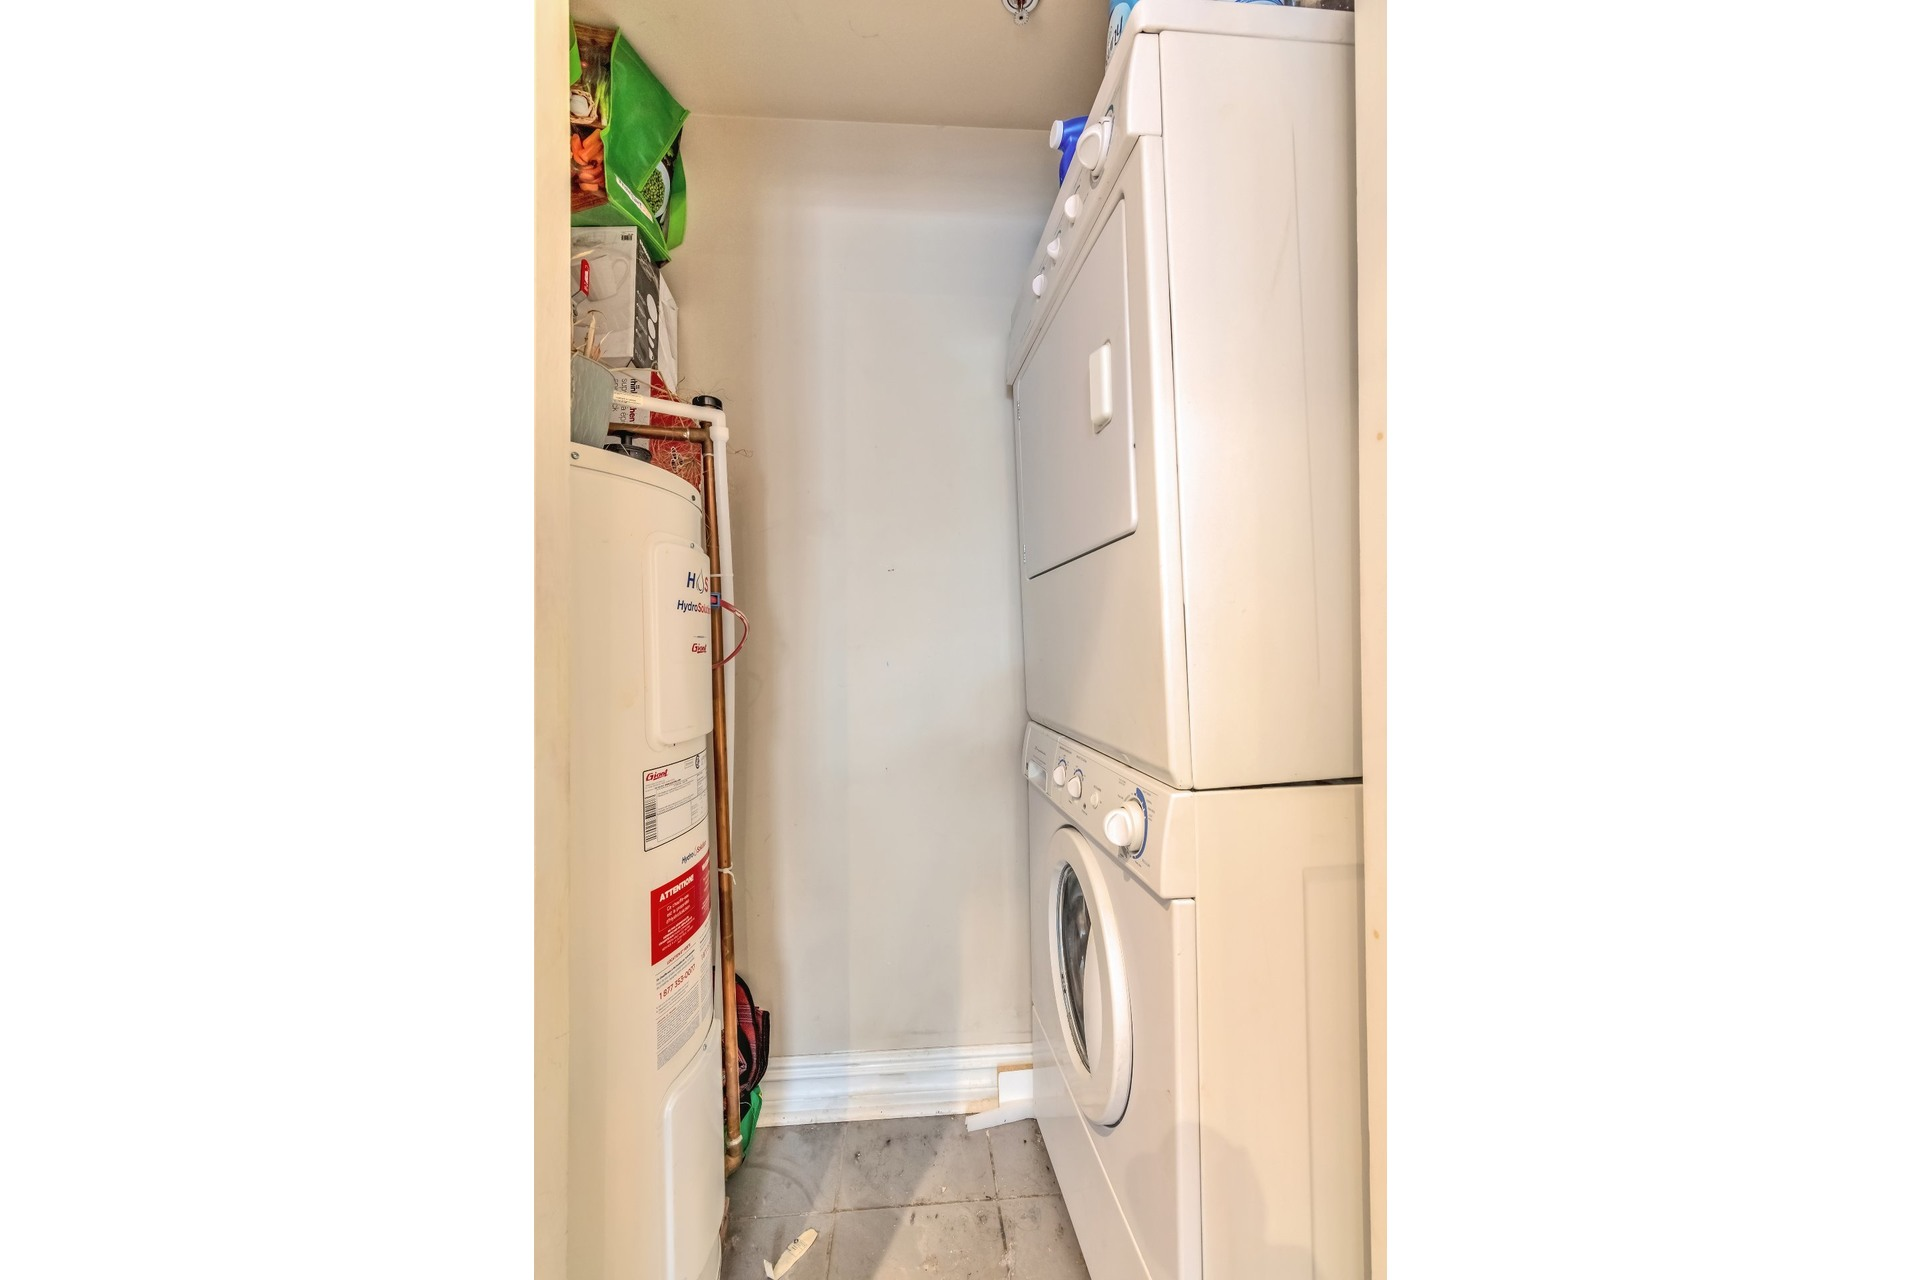 image 21 - Departamento En venta Le Plateau-Mont-Royal Montréal  - 3 habitaciones